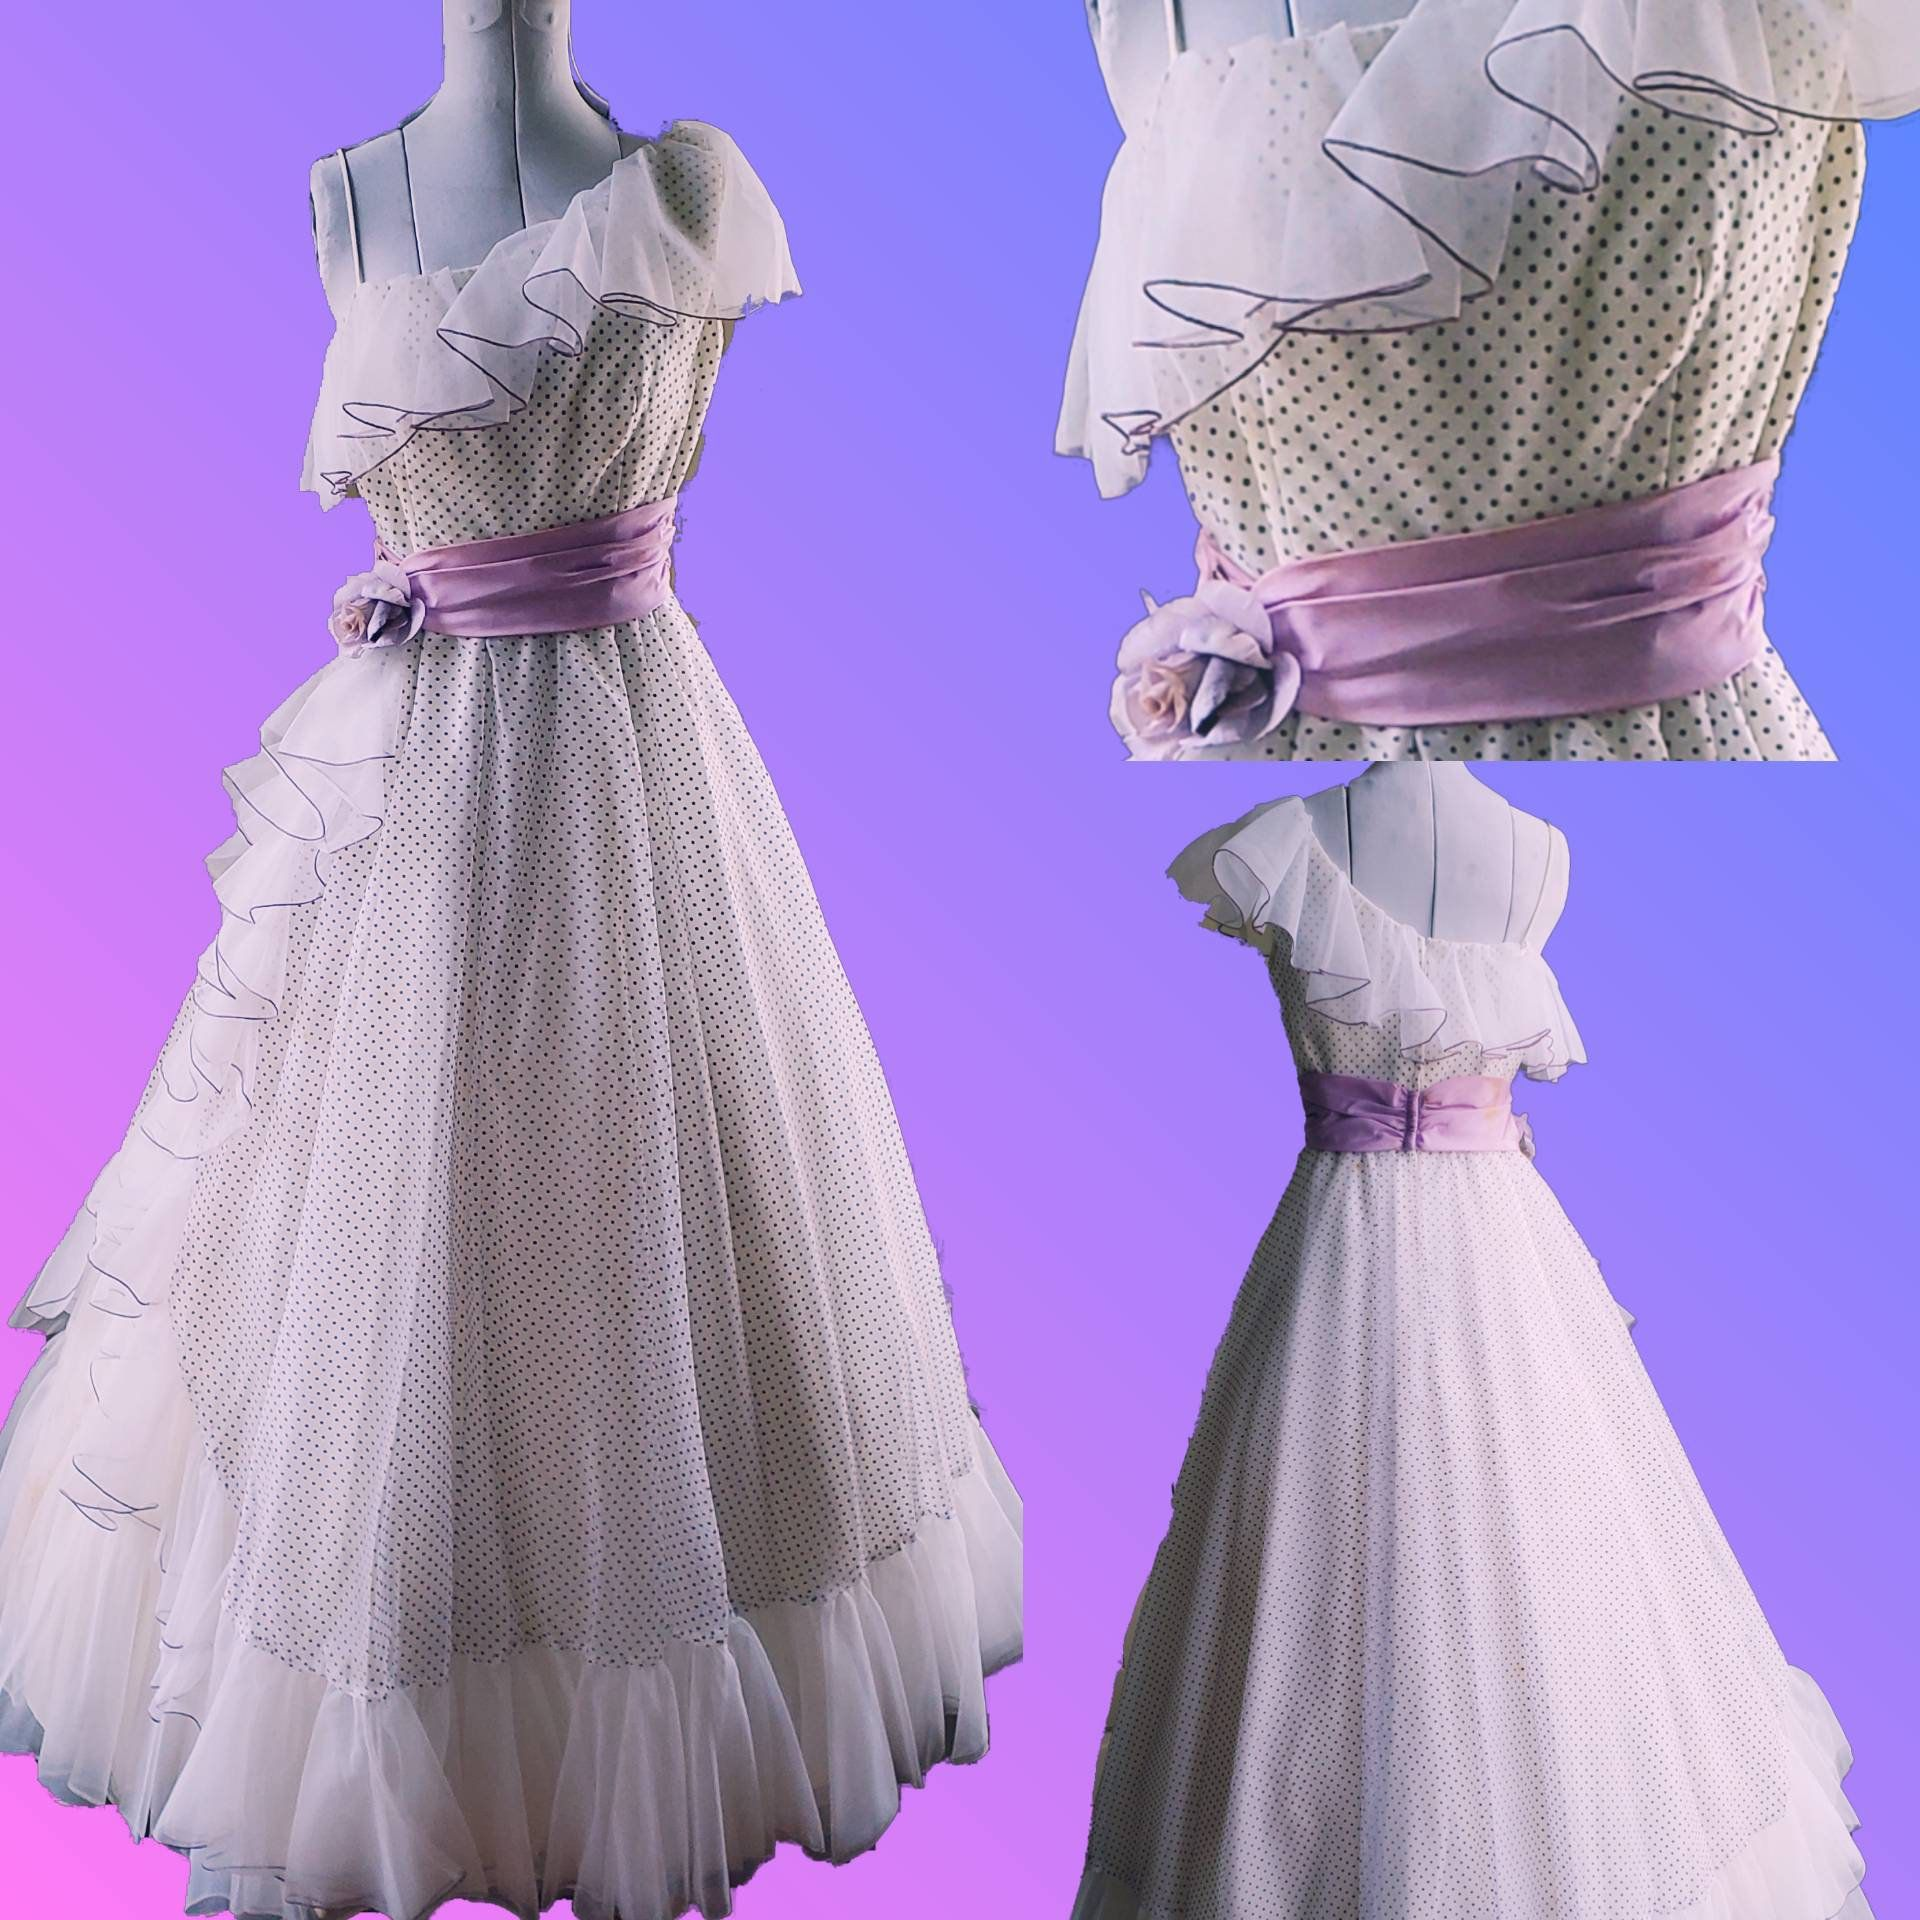 80s Prom Dress Sale Vintage Prom Dress White Chiffon Etsy Prom Dresses Vintage 80s Prom Dress Polka Dot Prom Dresses [ 1920 x 1920 Pixel ]